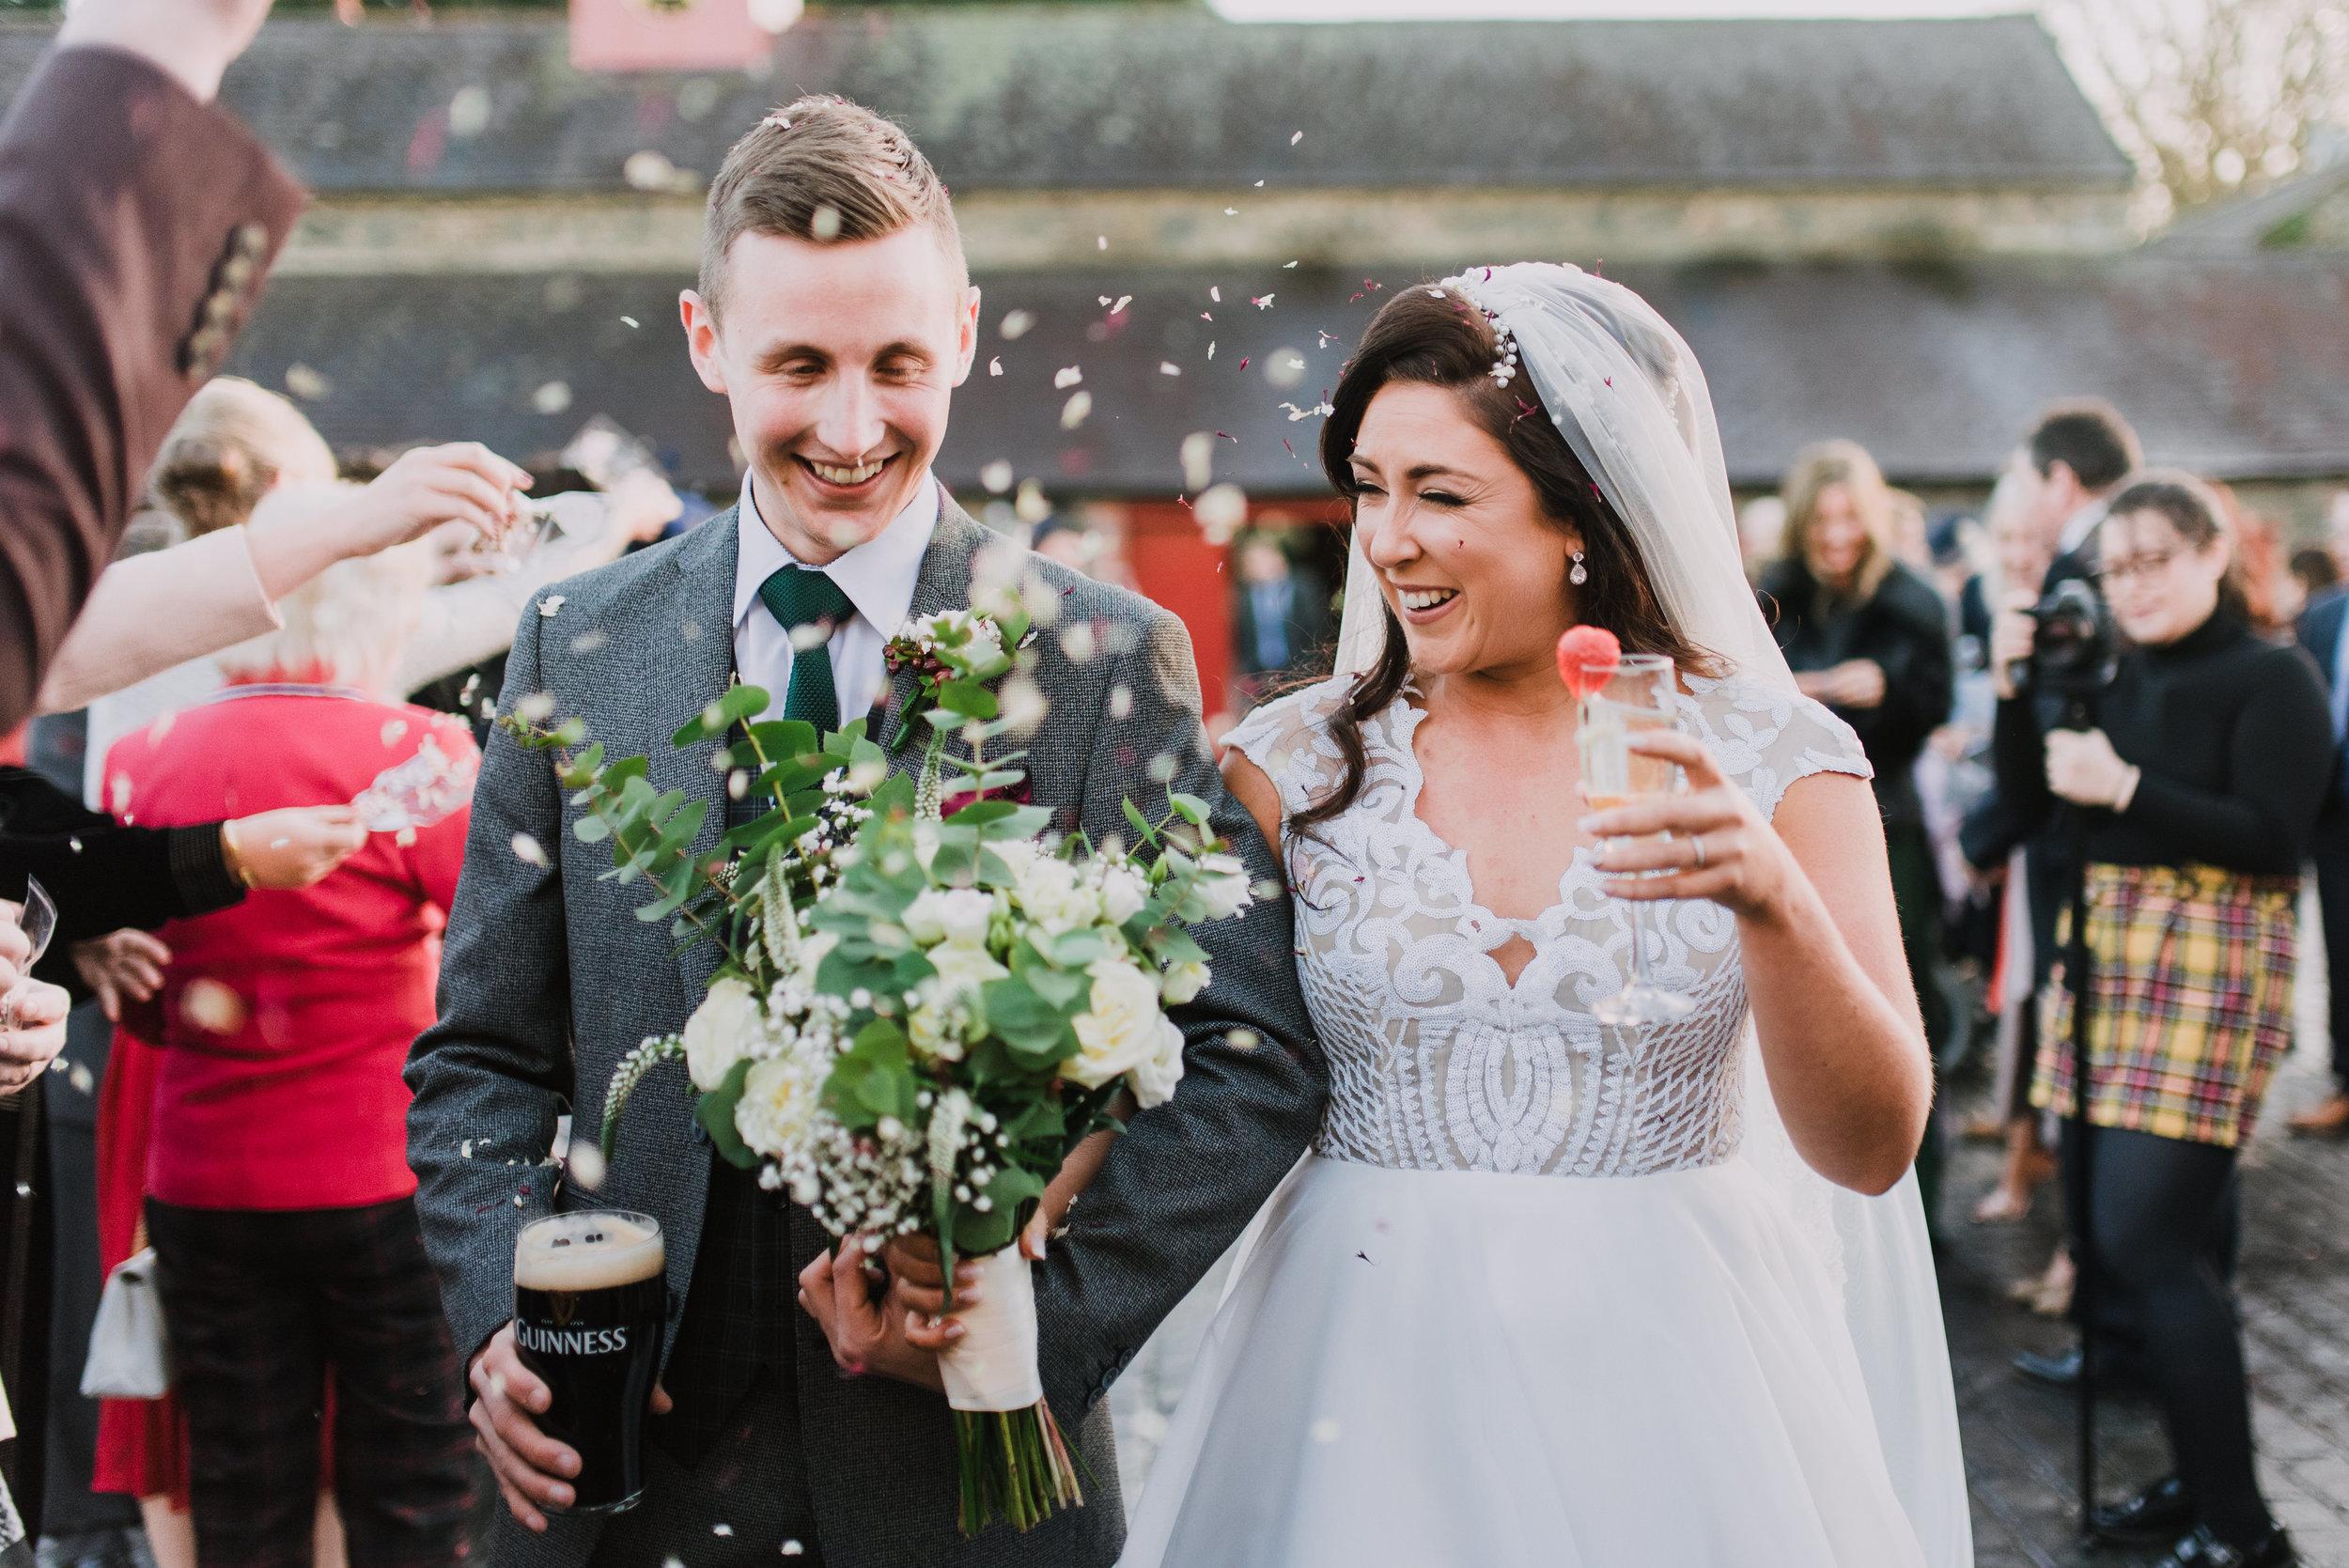 larchfield estate wedding, wedding venues northern ireland, barn wedding venues northern ireland, quirky weddings ni, wedding photos larchfield estate, shane todd's wedding (4).jpg